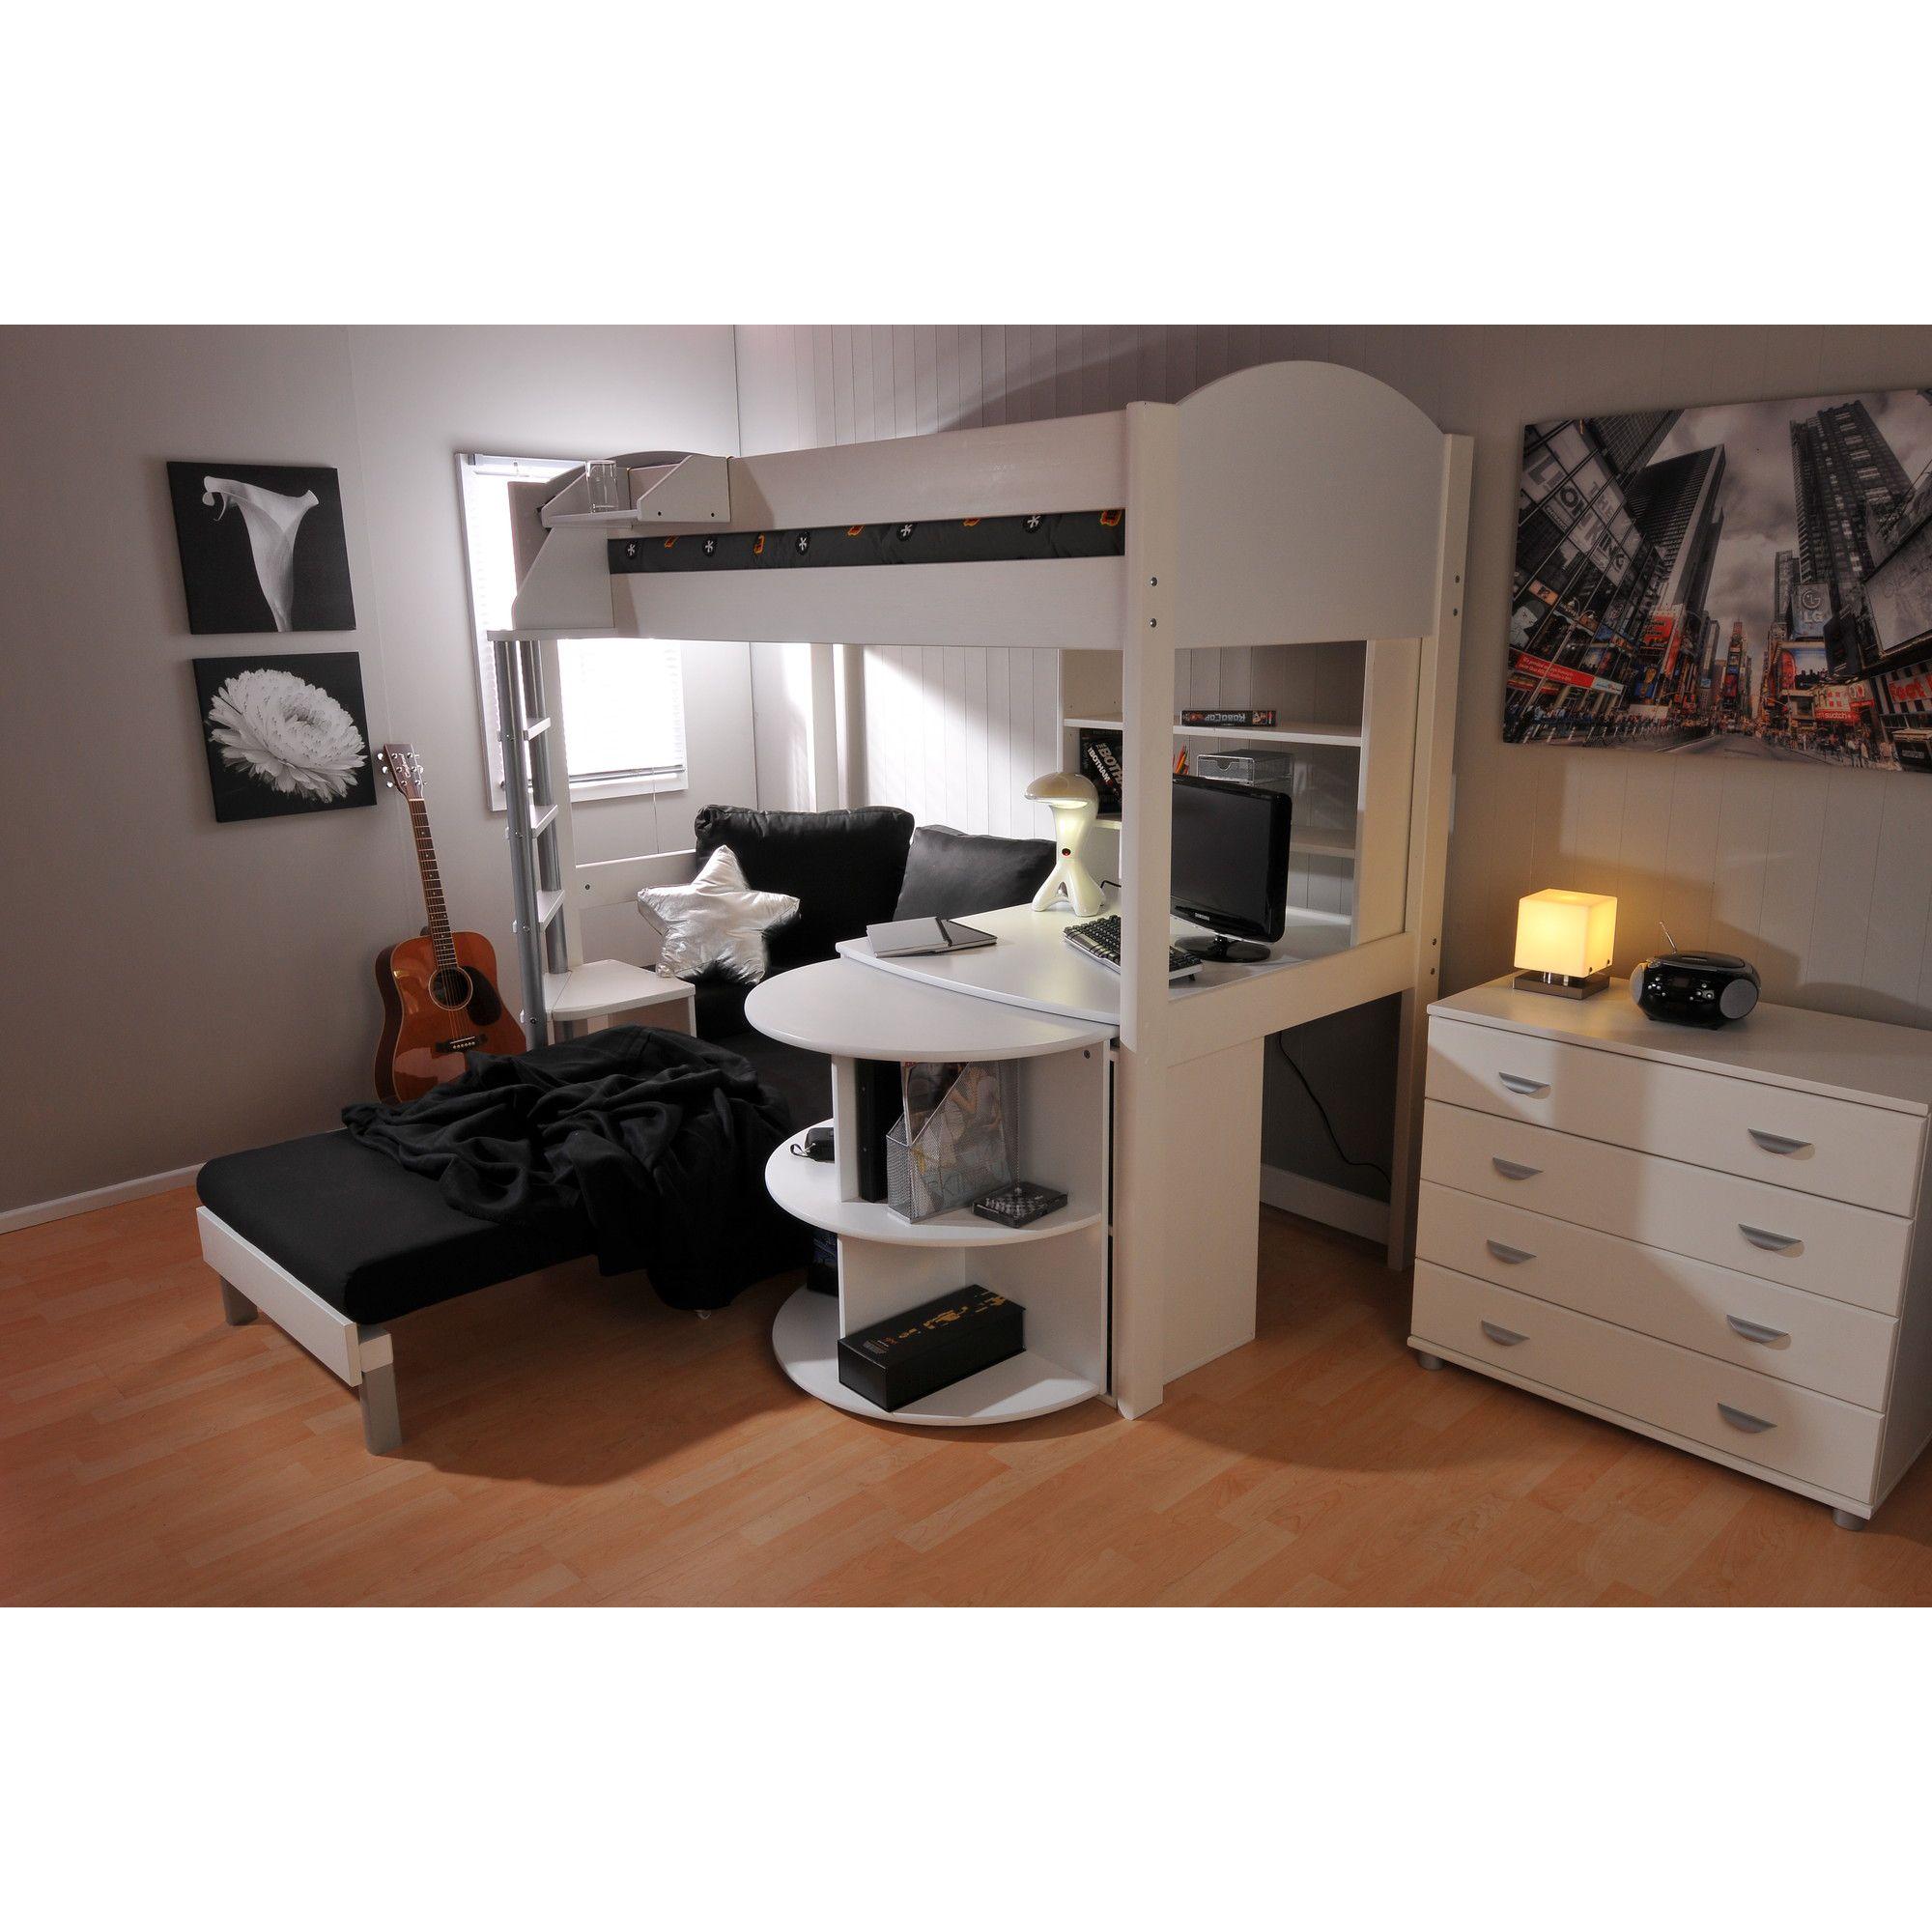 Stompa Casa High Sleeper Sofa Bed with Premium Desk - Antique - Lilac - Blue Denim at Tesco Direct